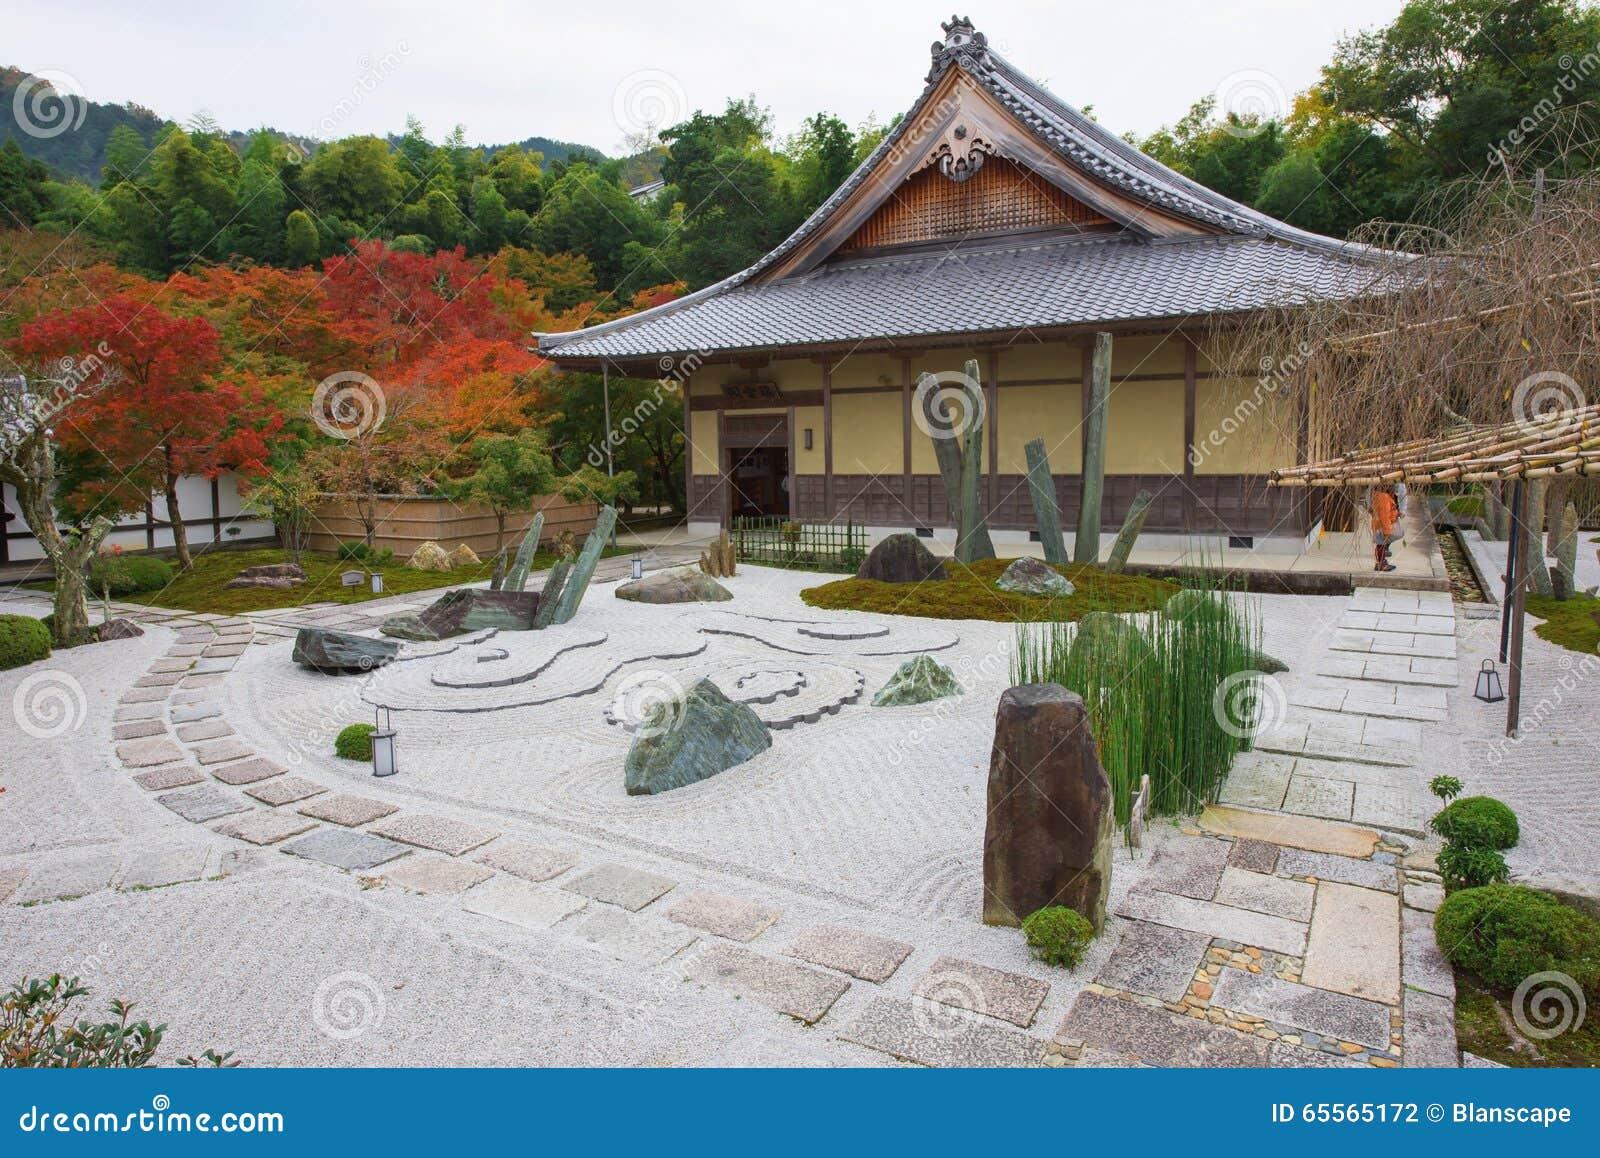 Stone Garden At Enkoji Temple In Kyoto Stock Photo Image Of Ponder